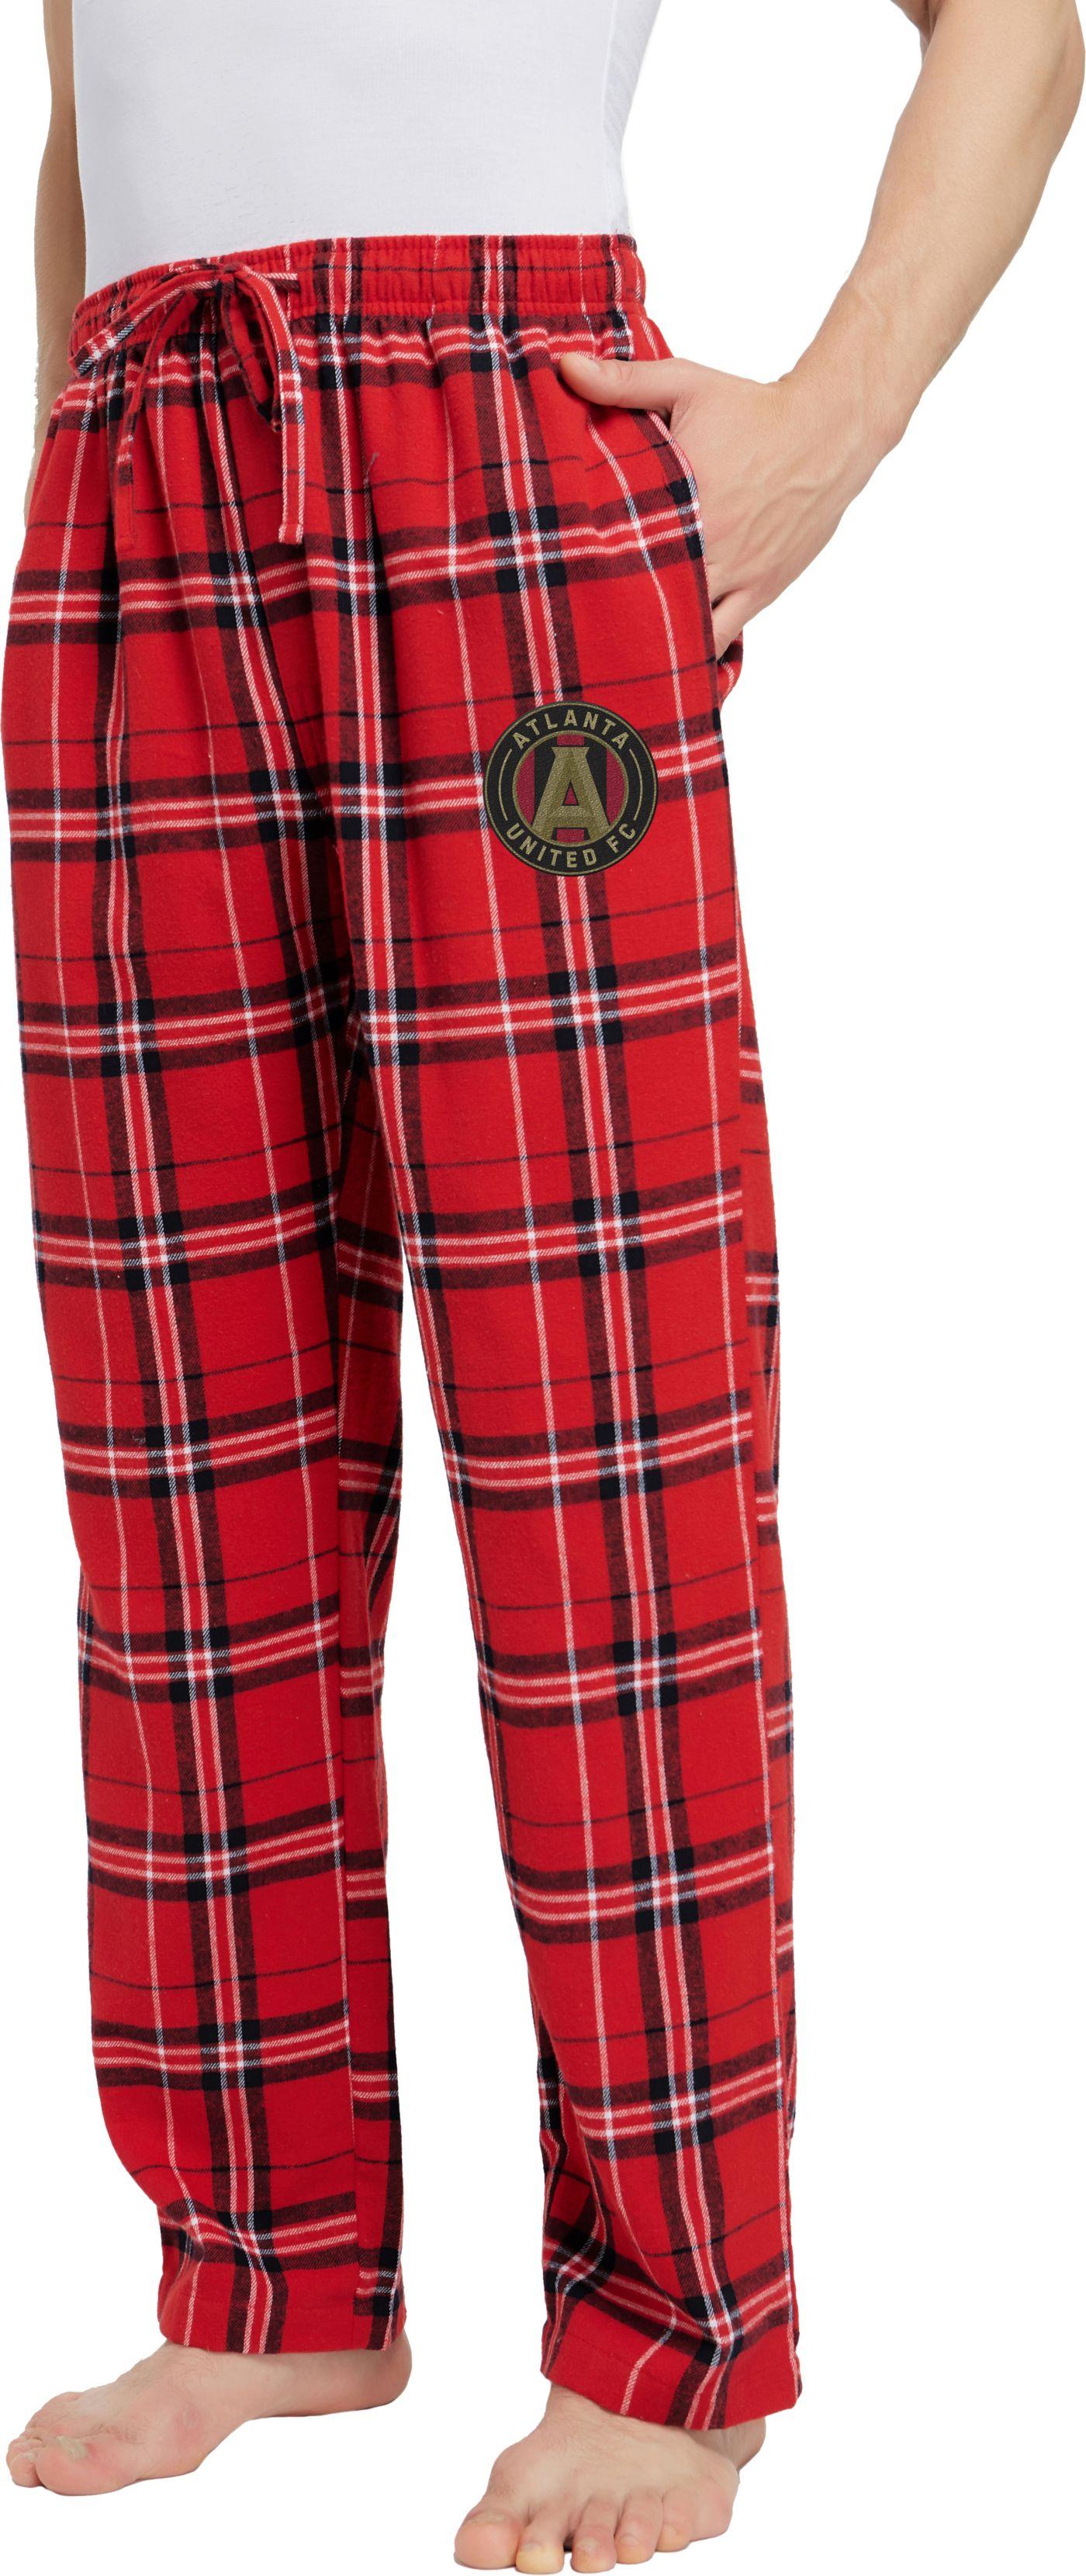 Concepts Sport Men's Atlanta United Hillstone Red Flannel Pants